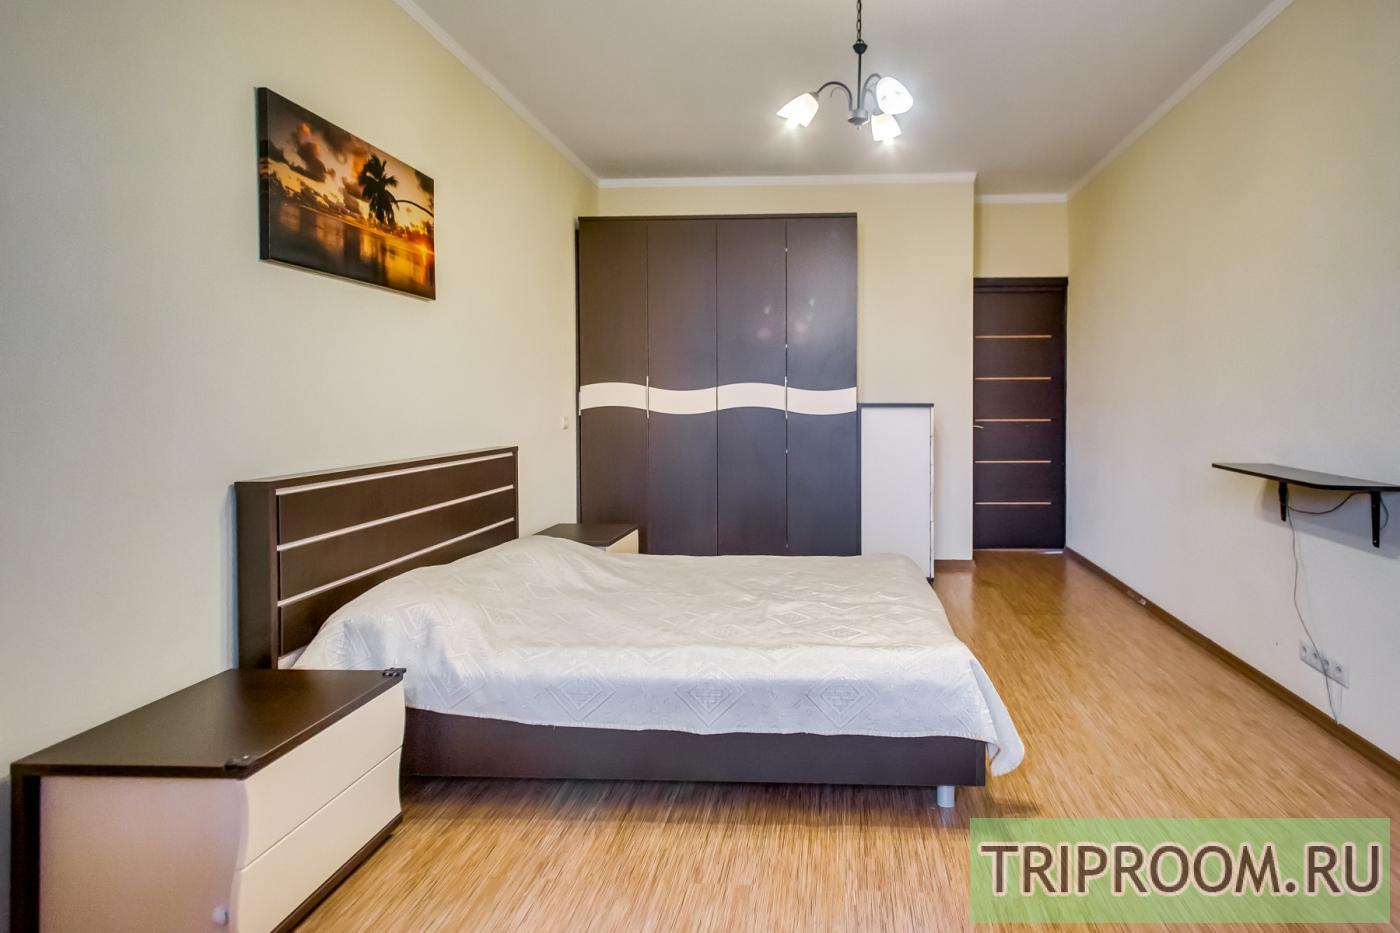 2-комнатная квартира посуточно (вариант № 23730), ул. Максима Горького улица, фото № 21